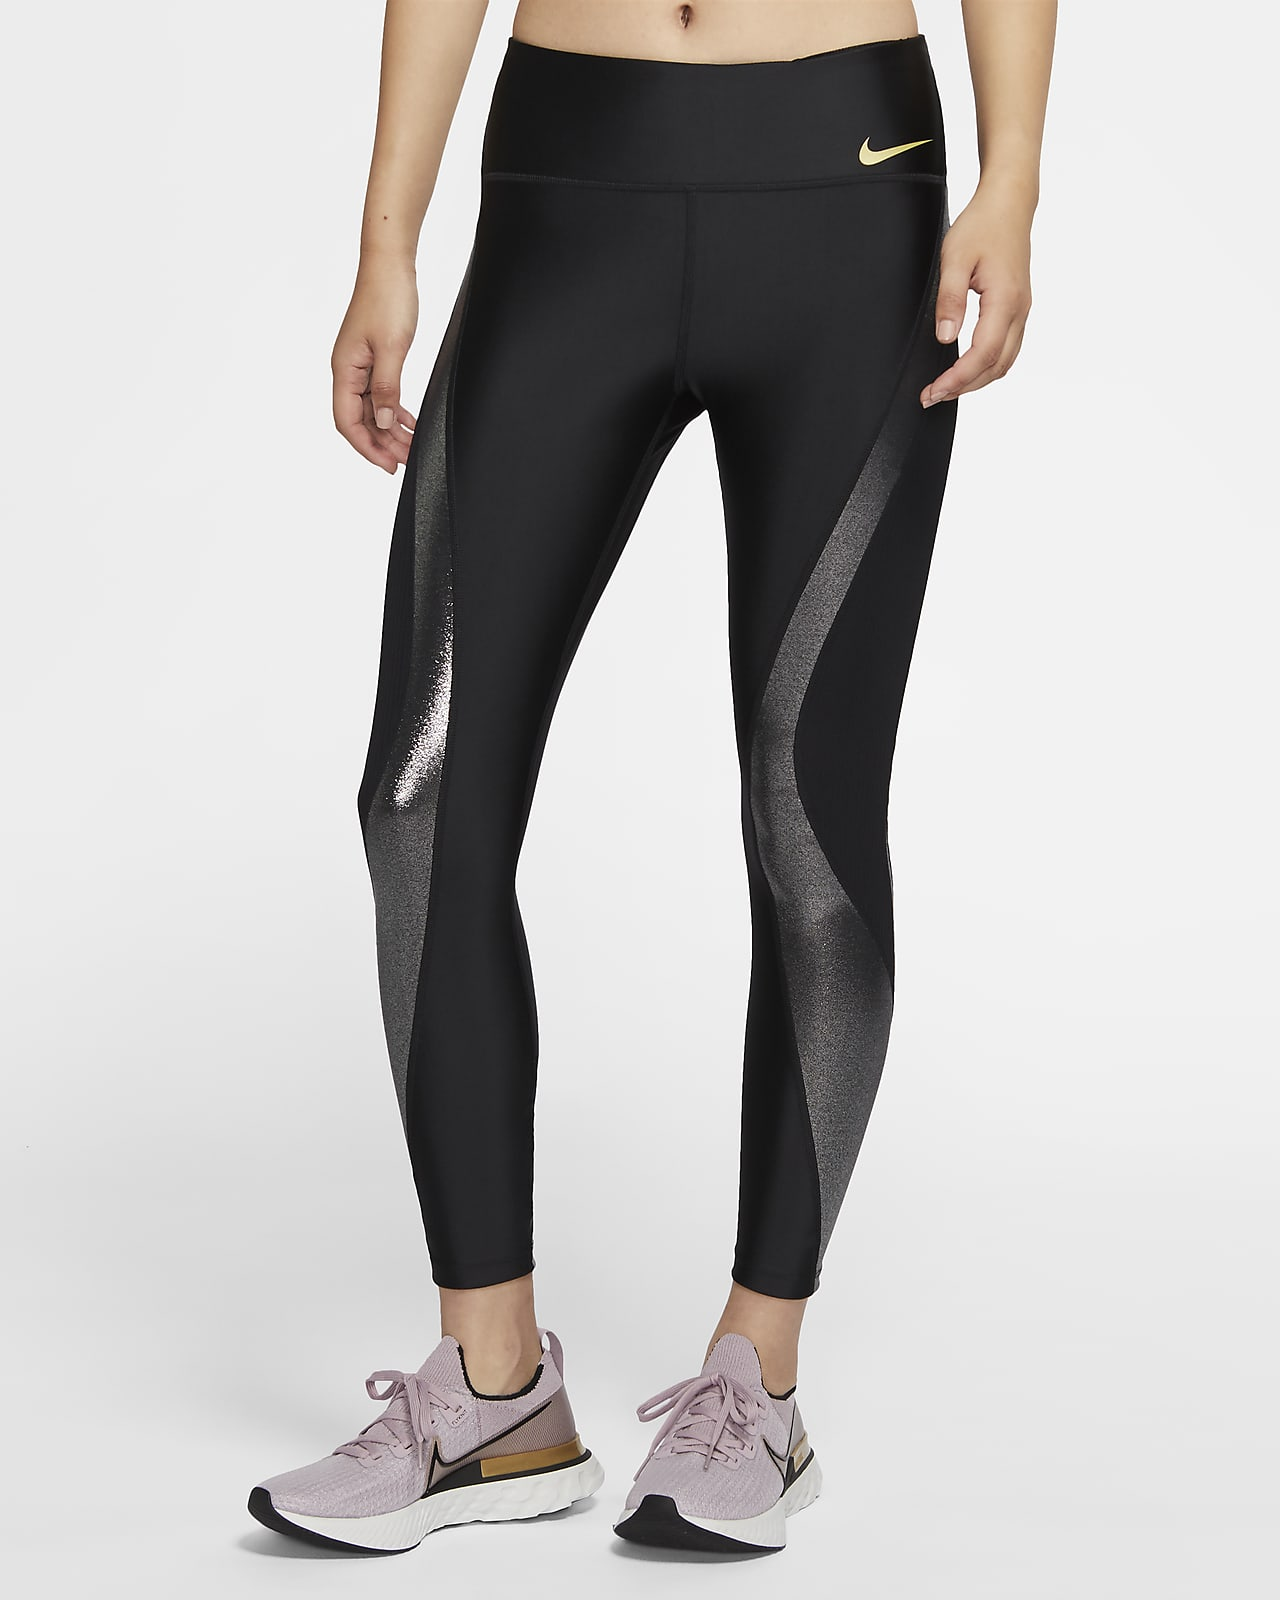 Nike Icon Clash Speed 7/8 女子跑步紧身裤